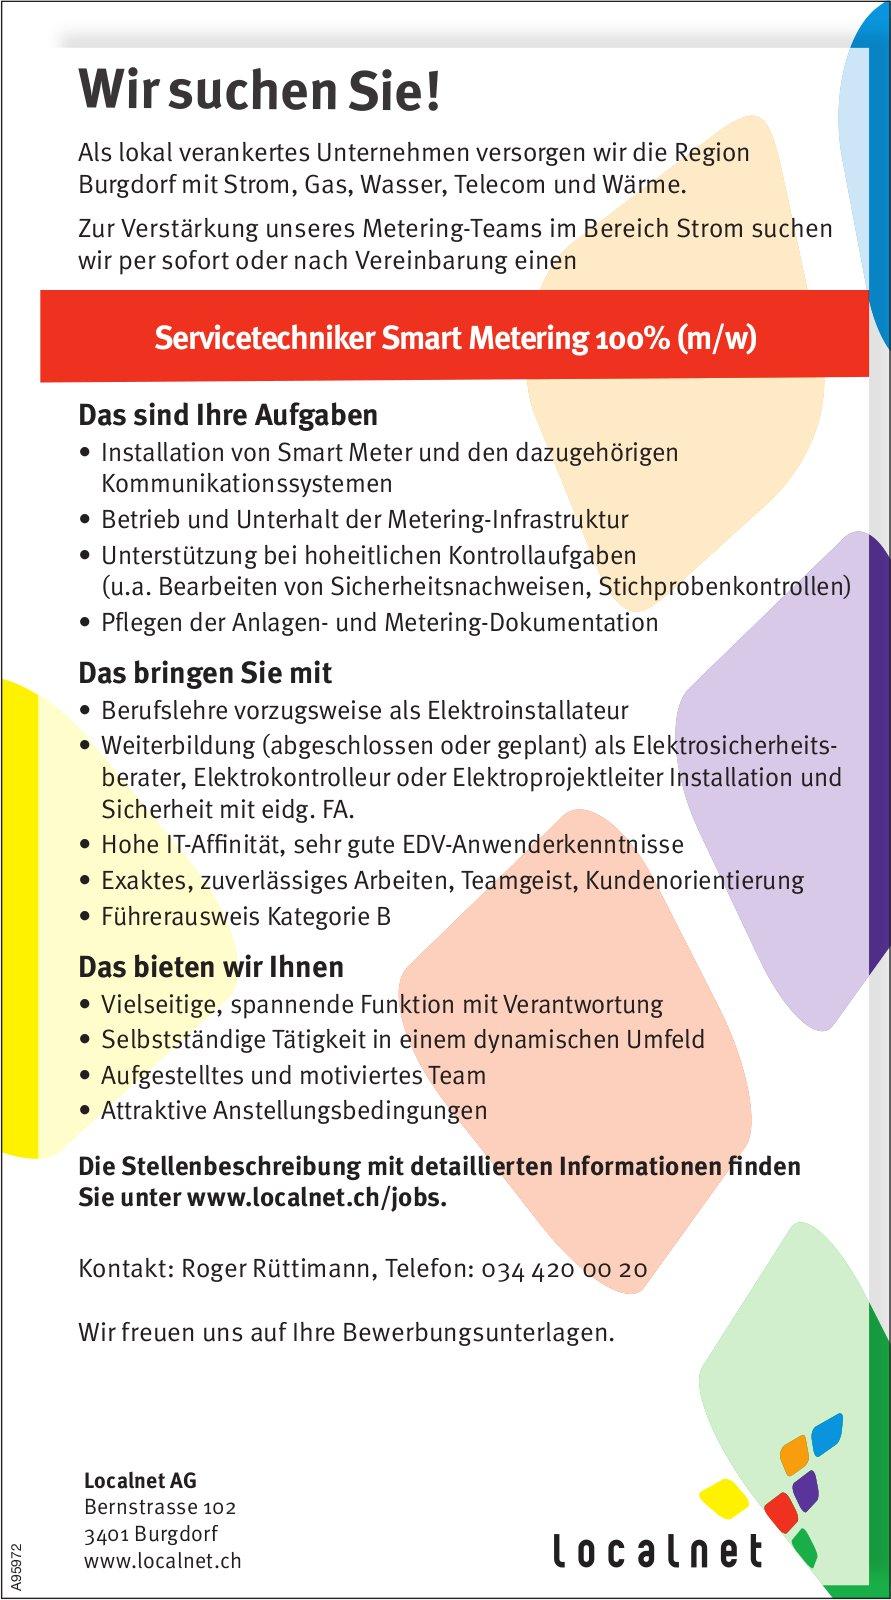 Servicetechniker Smart Metering 100% (m/w), Localnet AG, Burgdorf, gesucht